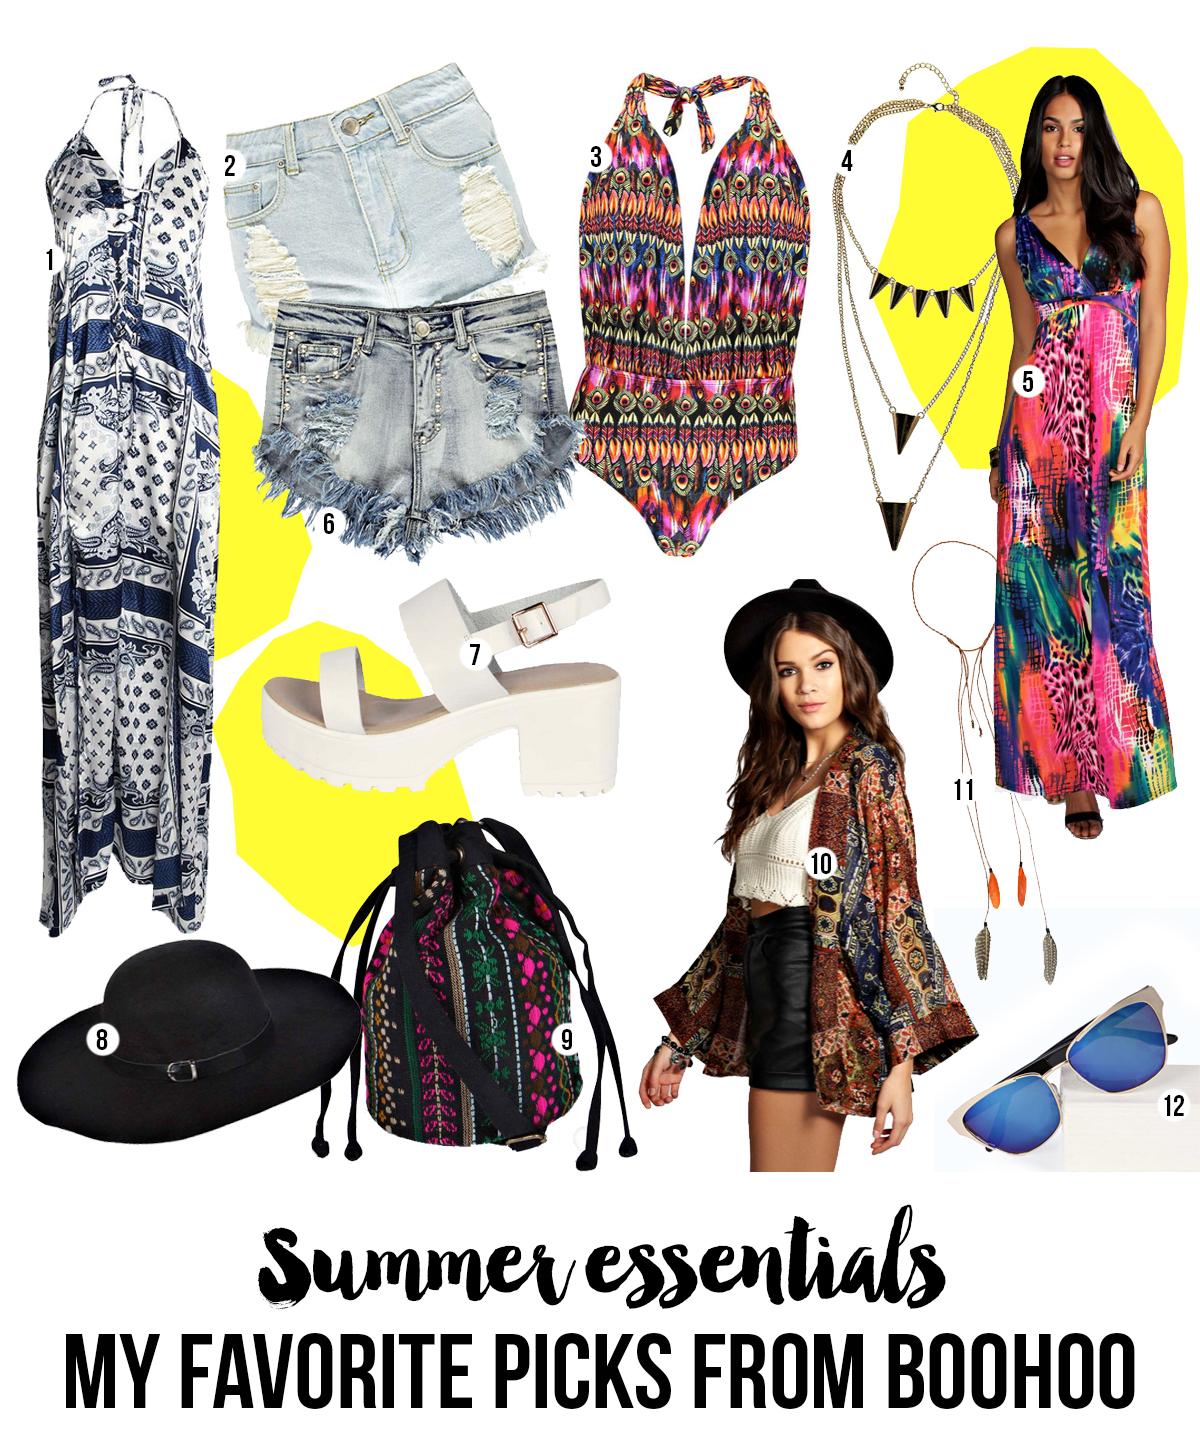 Summer Essentials: My Favorite Picks from Boohoo